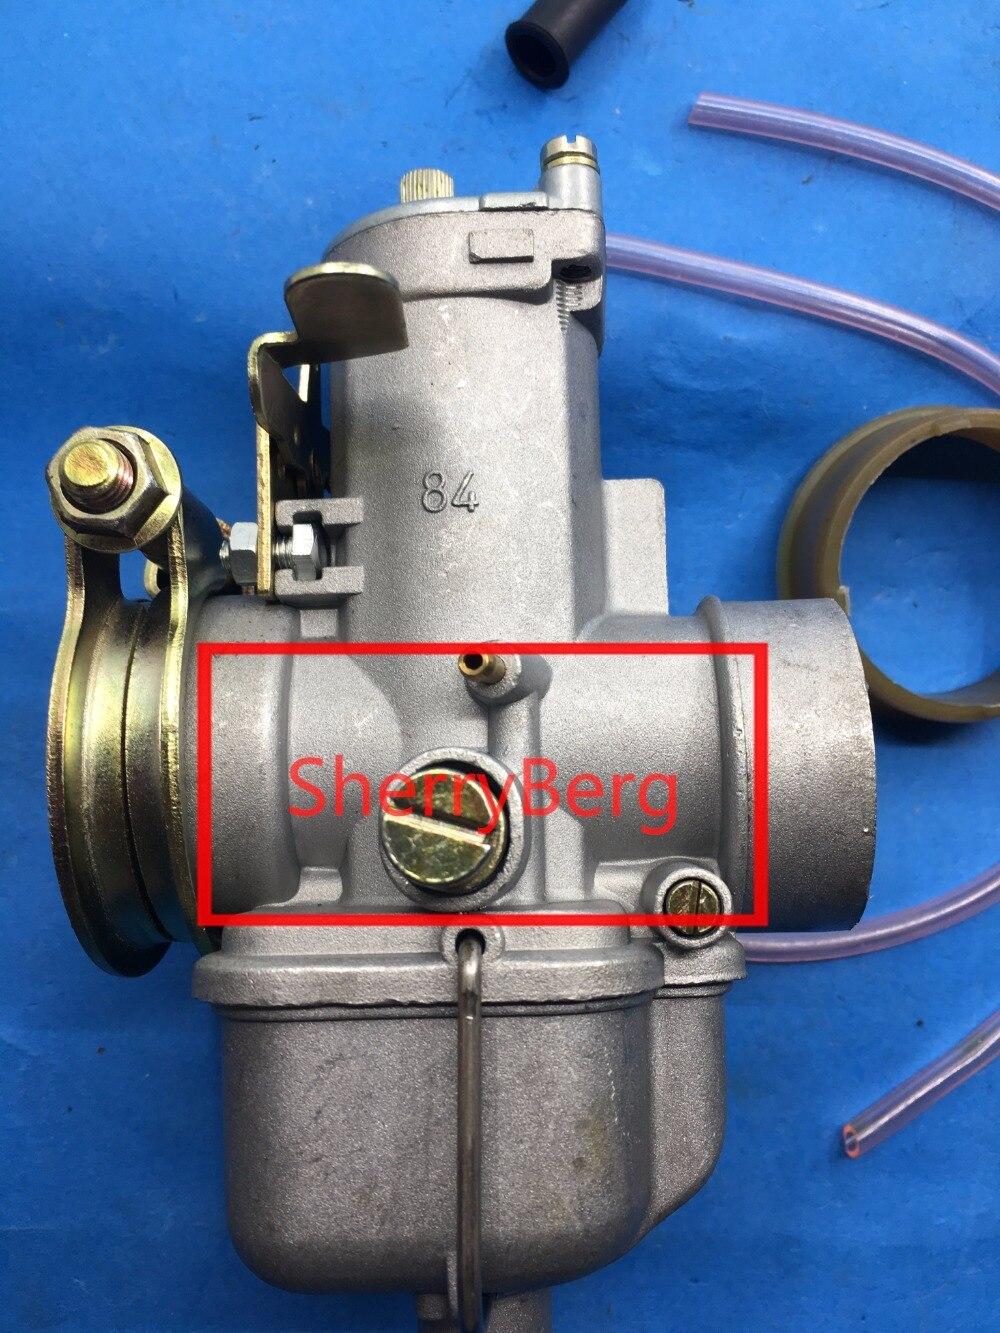 Carburateur SherryBerg vergaser carb Bing 84 KS MZ TS250 K125, 250,350 carburateur carby Bing84 vélo universel fit allemagne